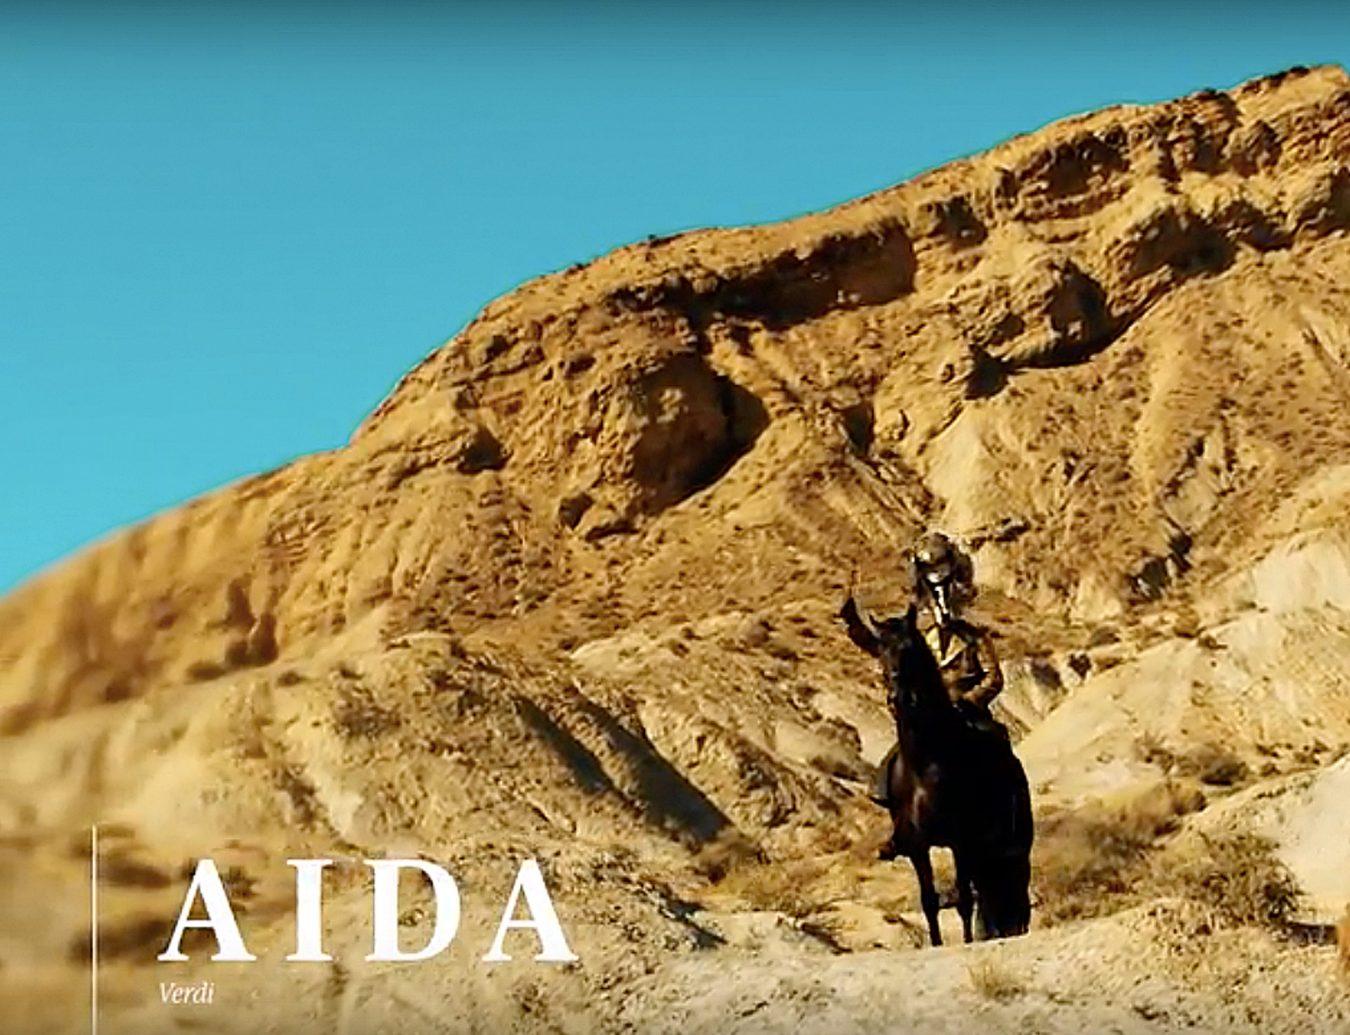 AIDA_Opera Australia_Digital, Director/Choreograph: Davide Livermore, CD/EP: Paolo Gep Cucco, Agency D-Wok Italia